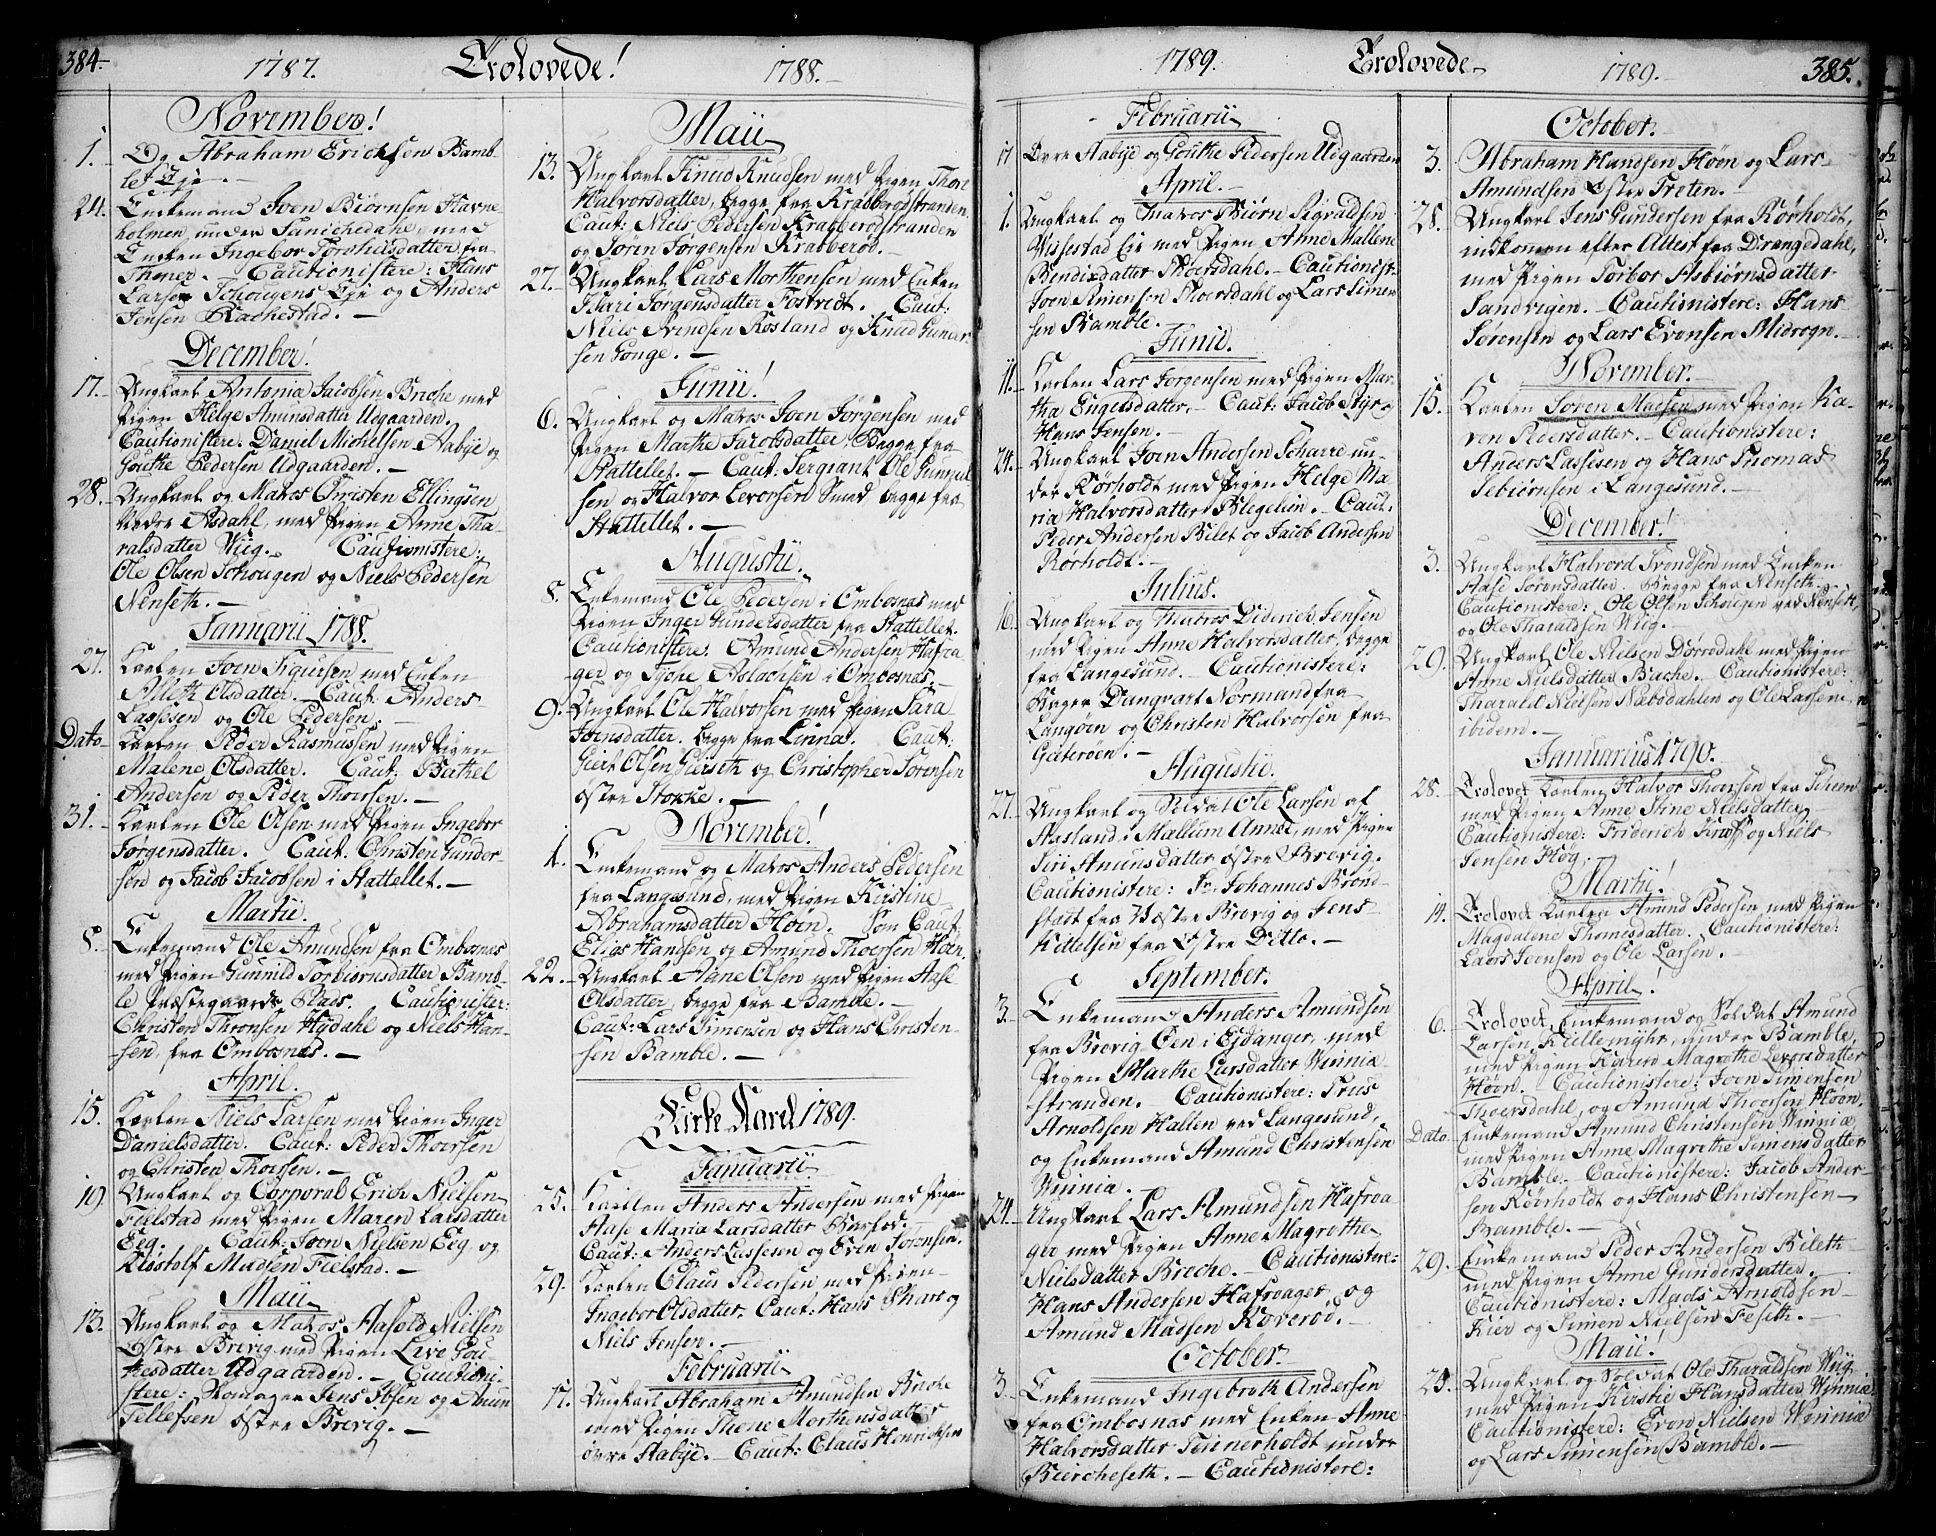 SAKO, Bamble kirkebøker, F/Fa/L0002: Ministerialbok nr. I 2, 1775-1814, s. 384-385